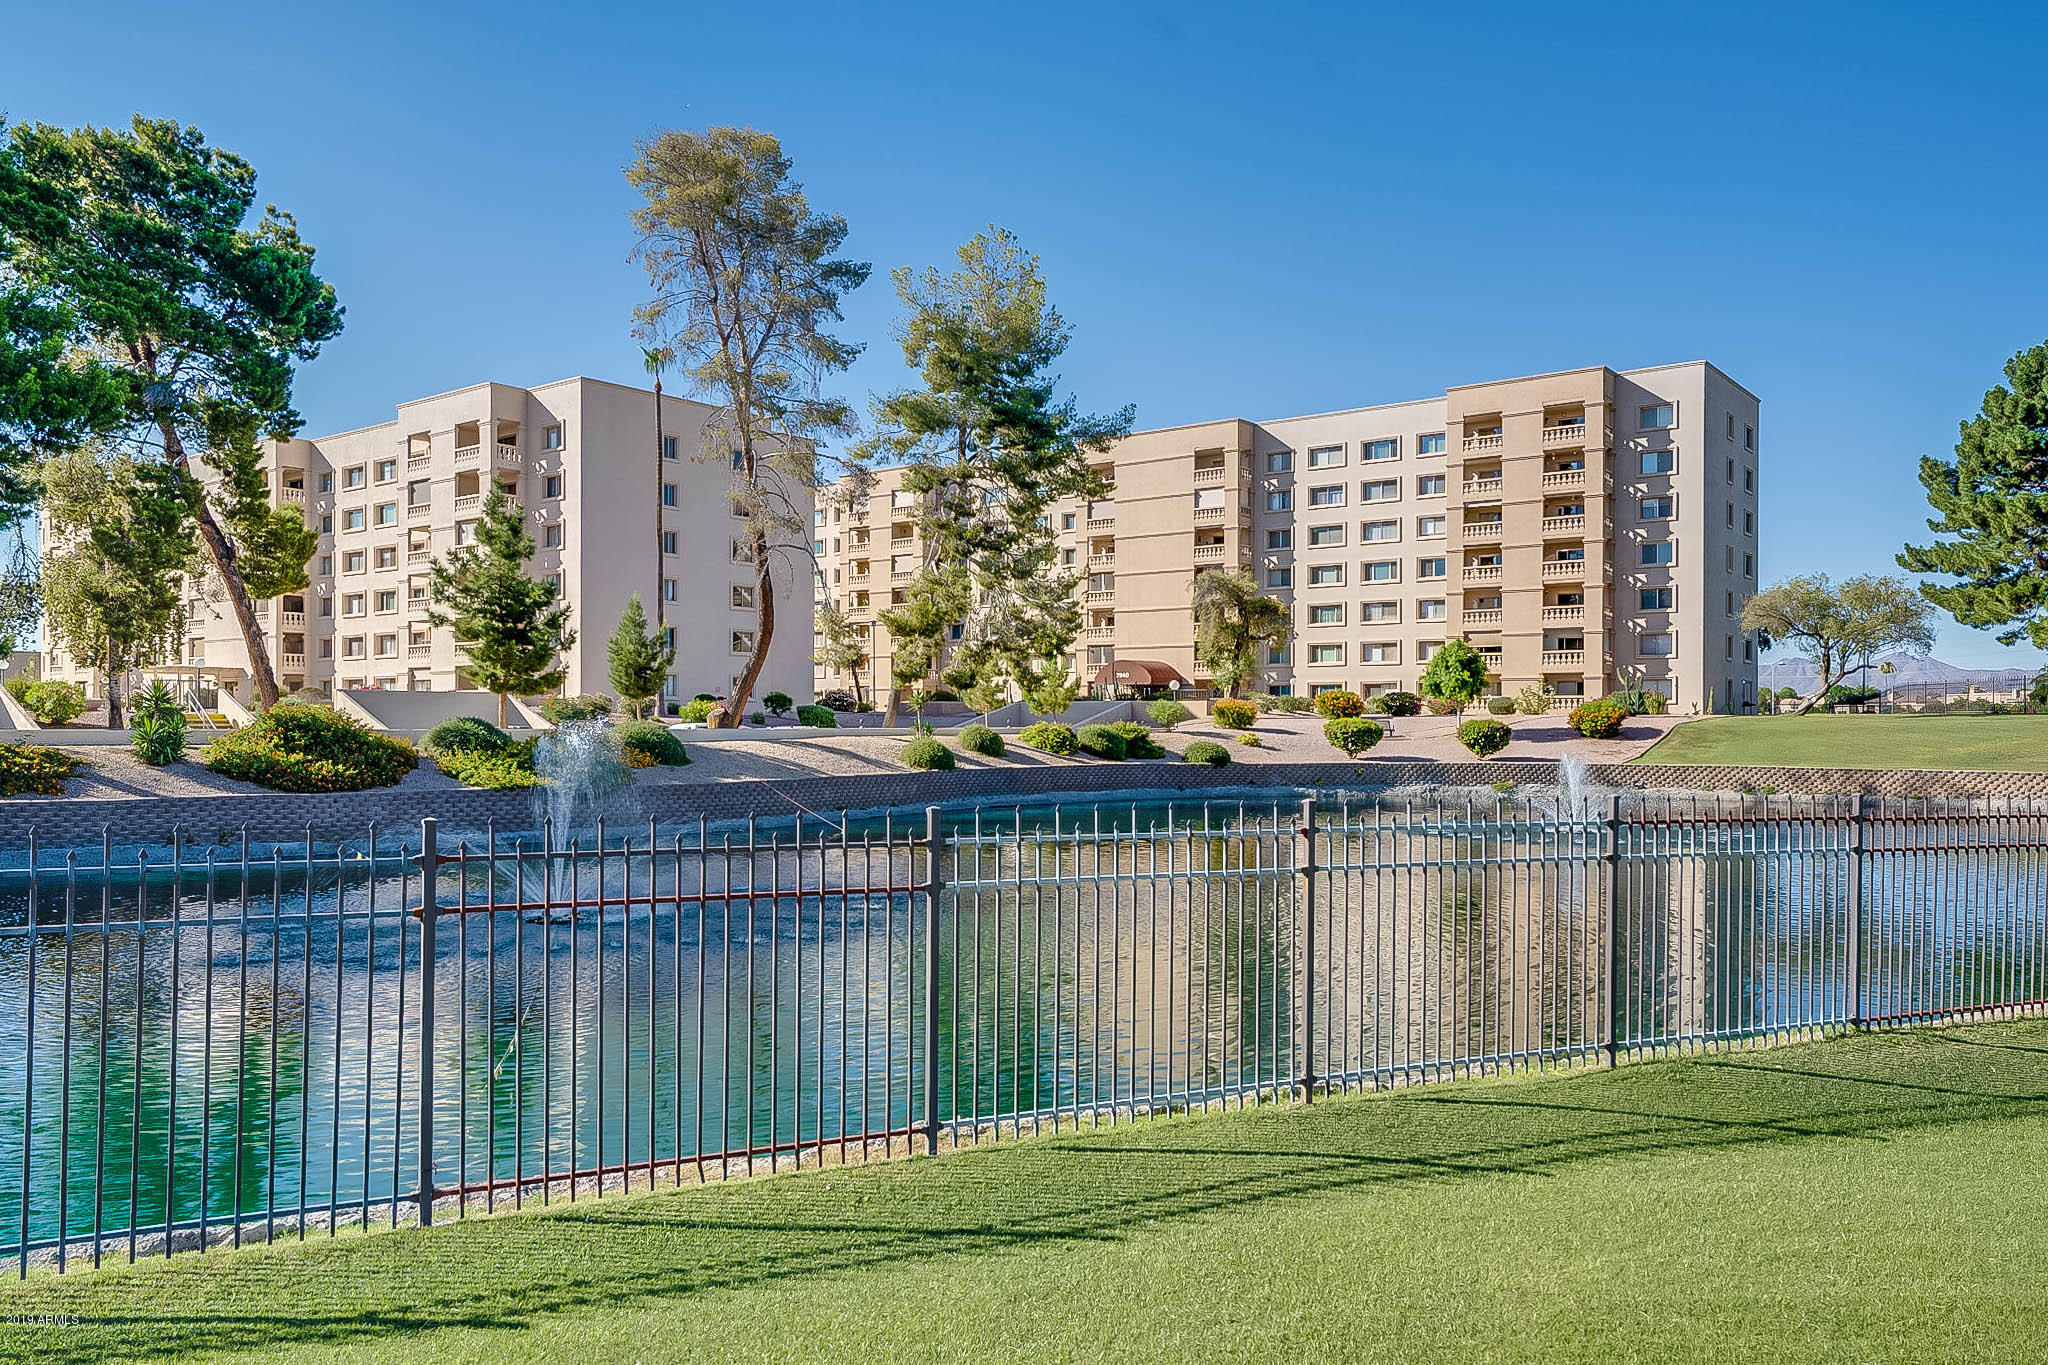 Photo of 7940 E CAMELBACK Road #409, Scottsdale, AZ 85251